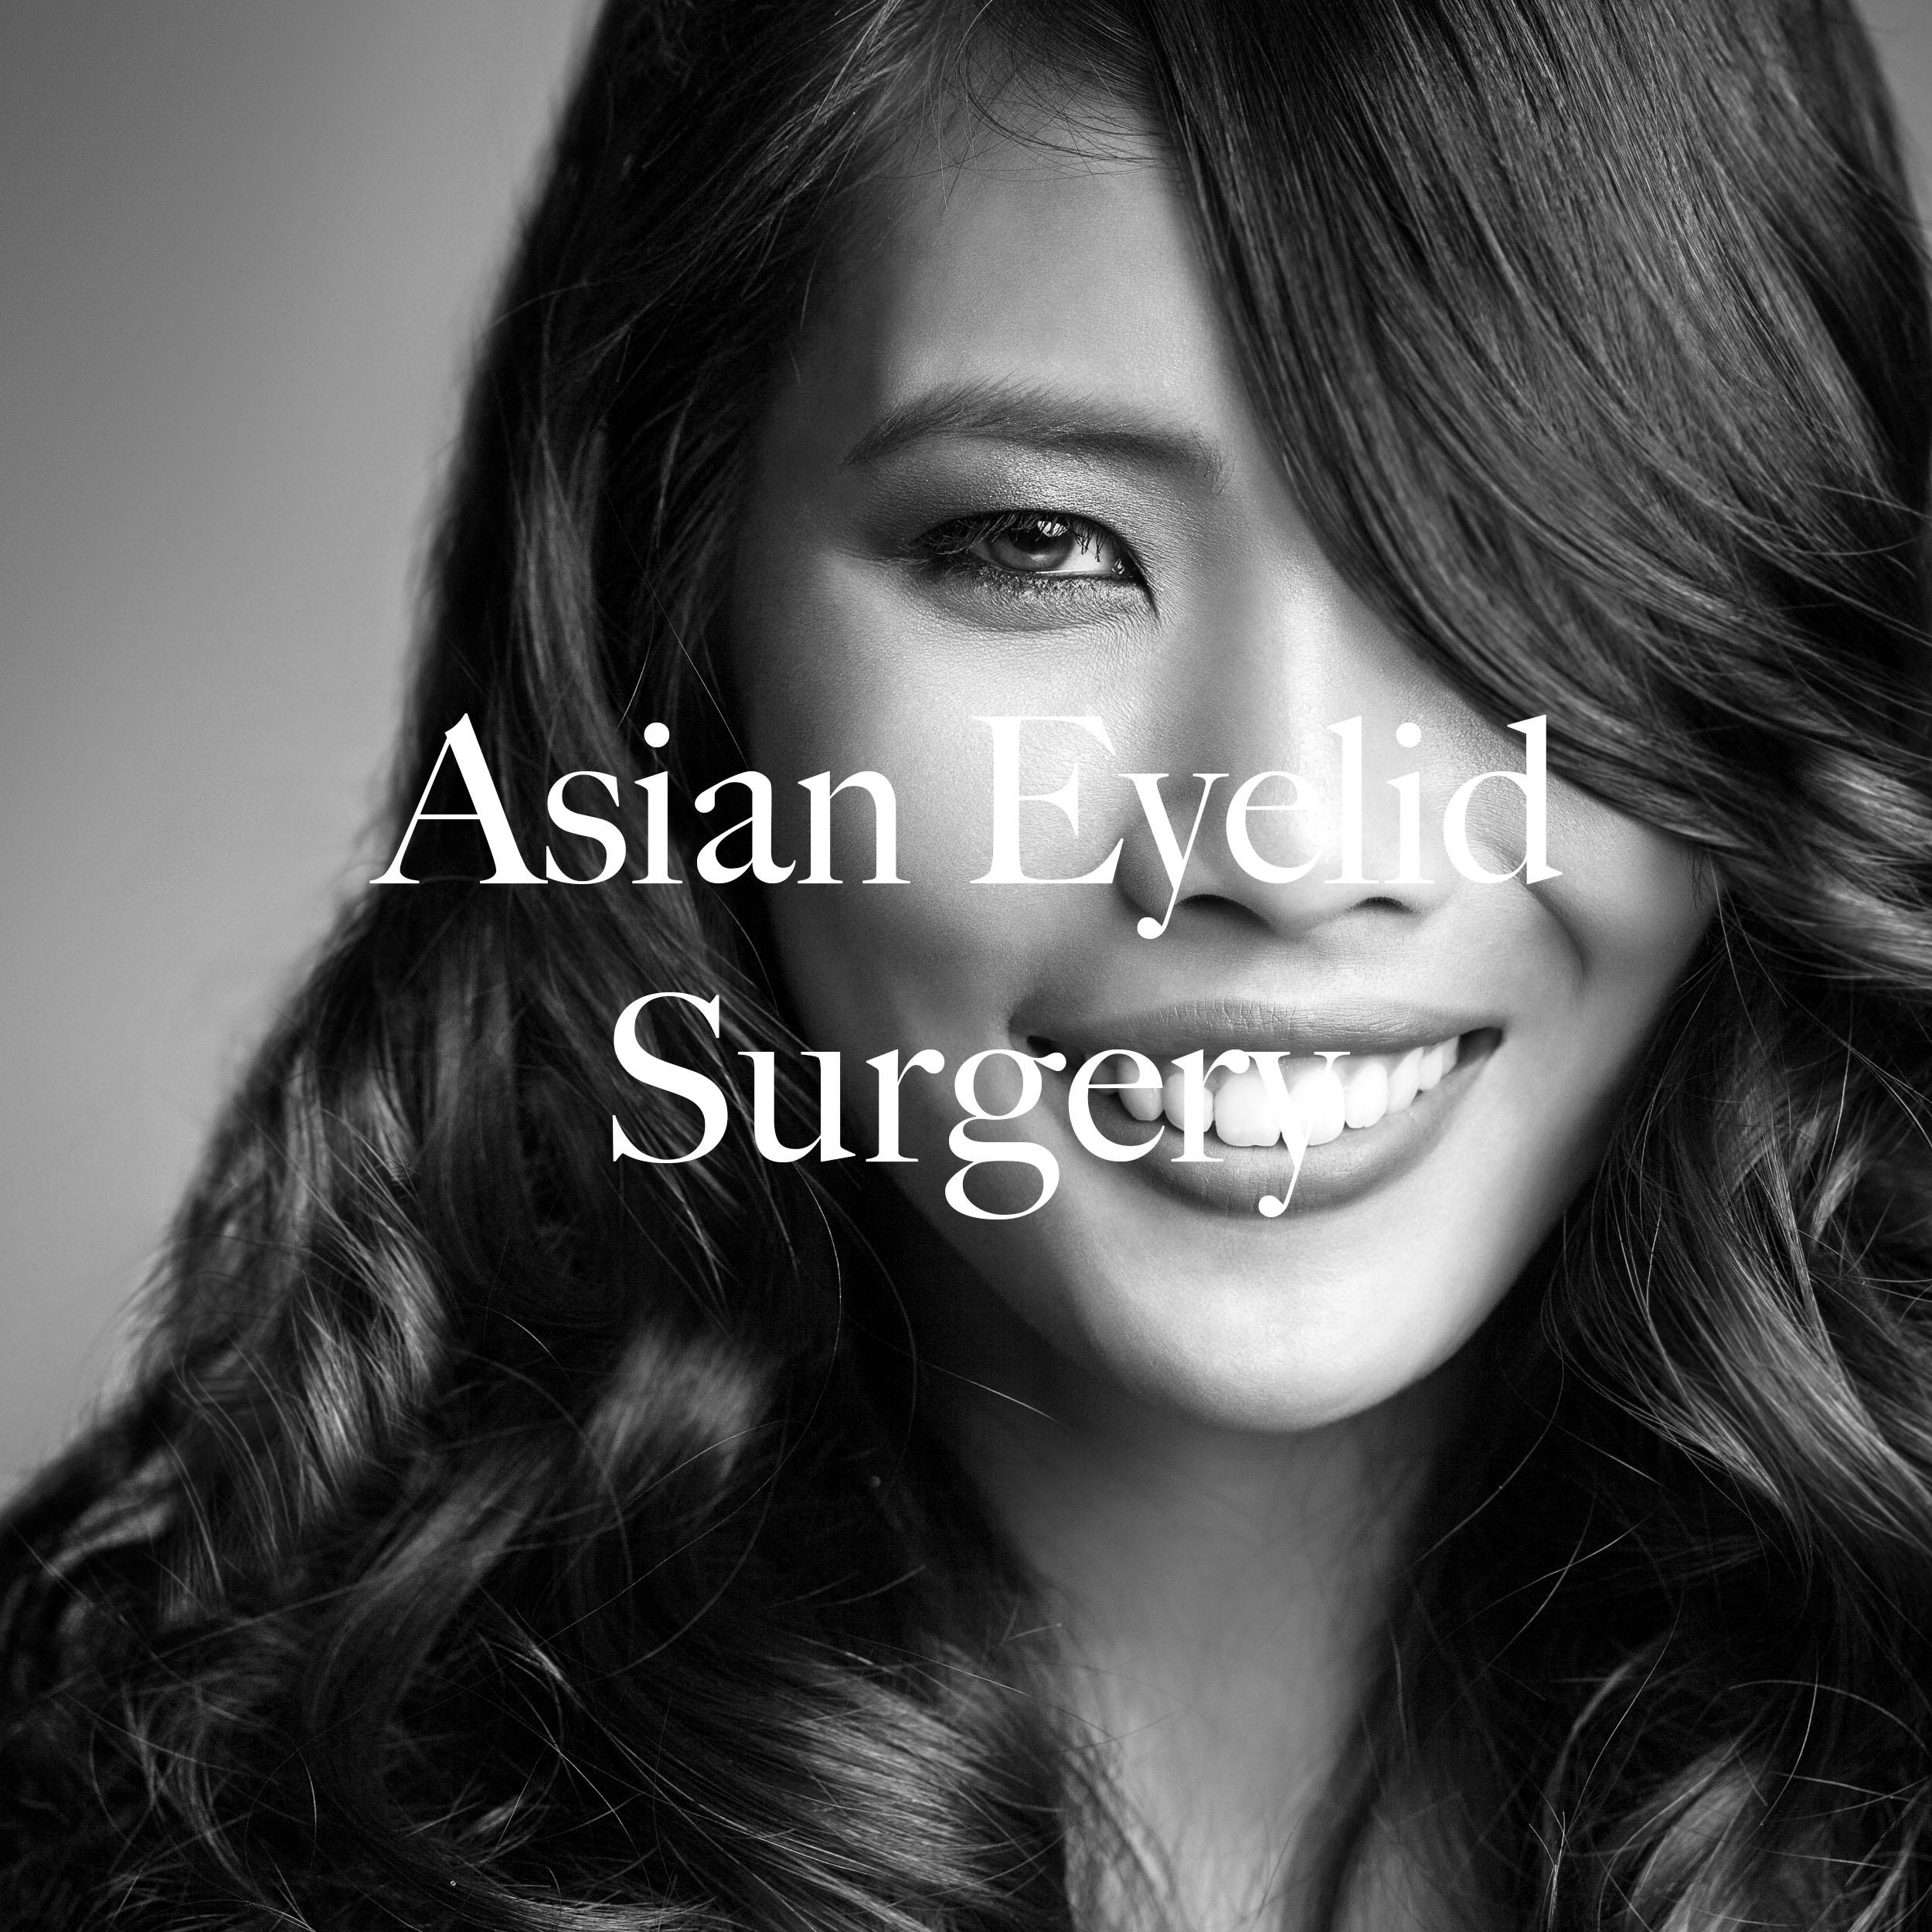 asianeyelidsurgery.jpg